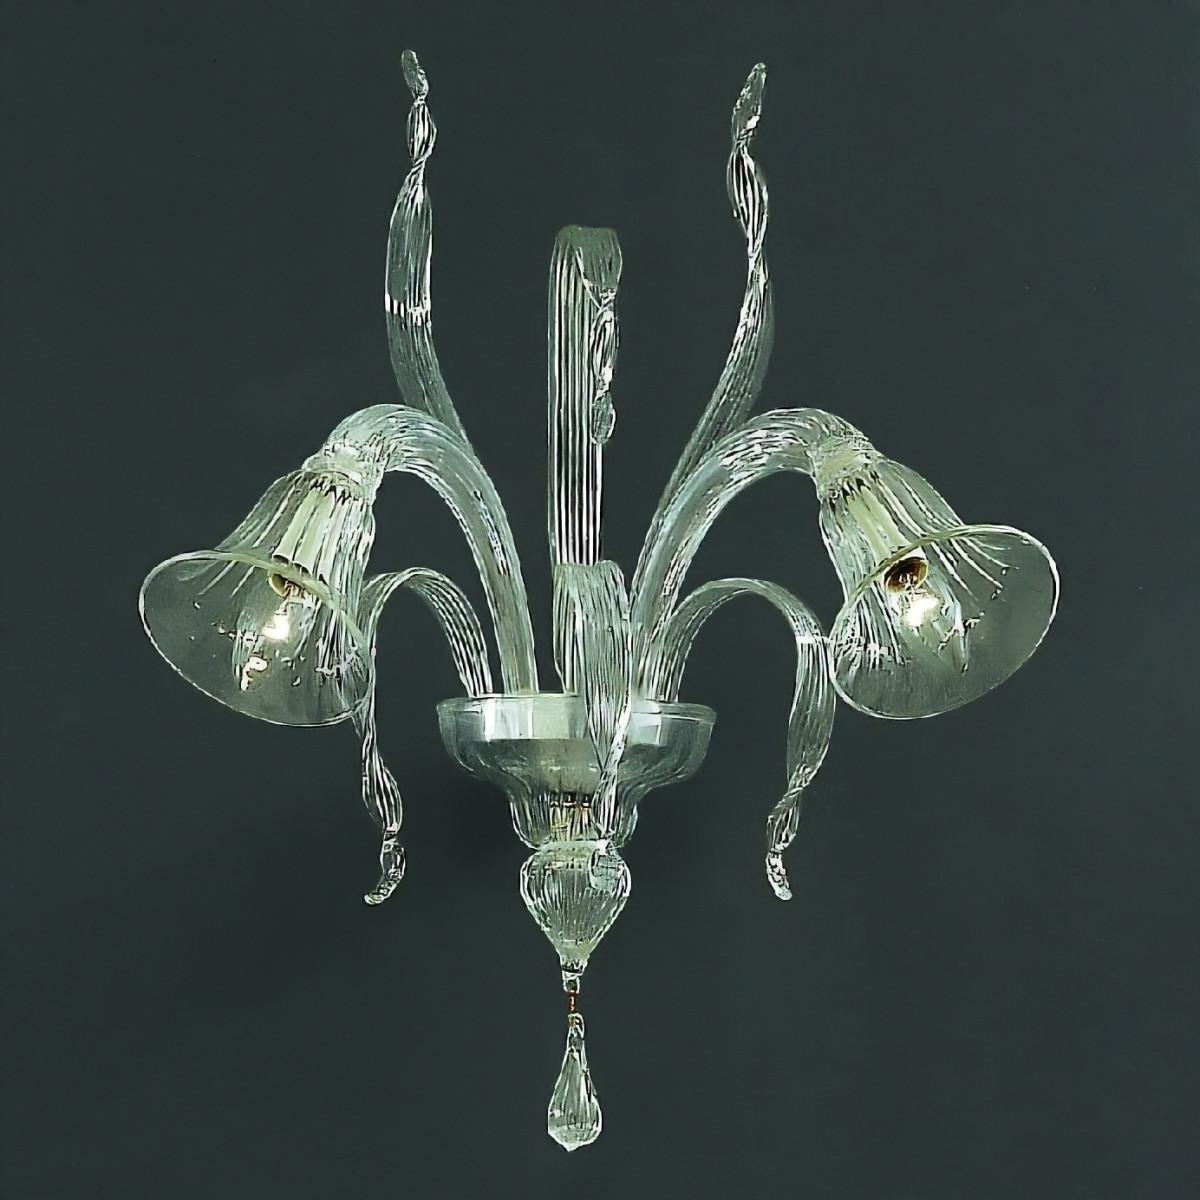 Rialto 2 Leuchten aus Murano-Leuchter transparente Farbe